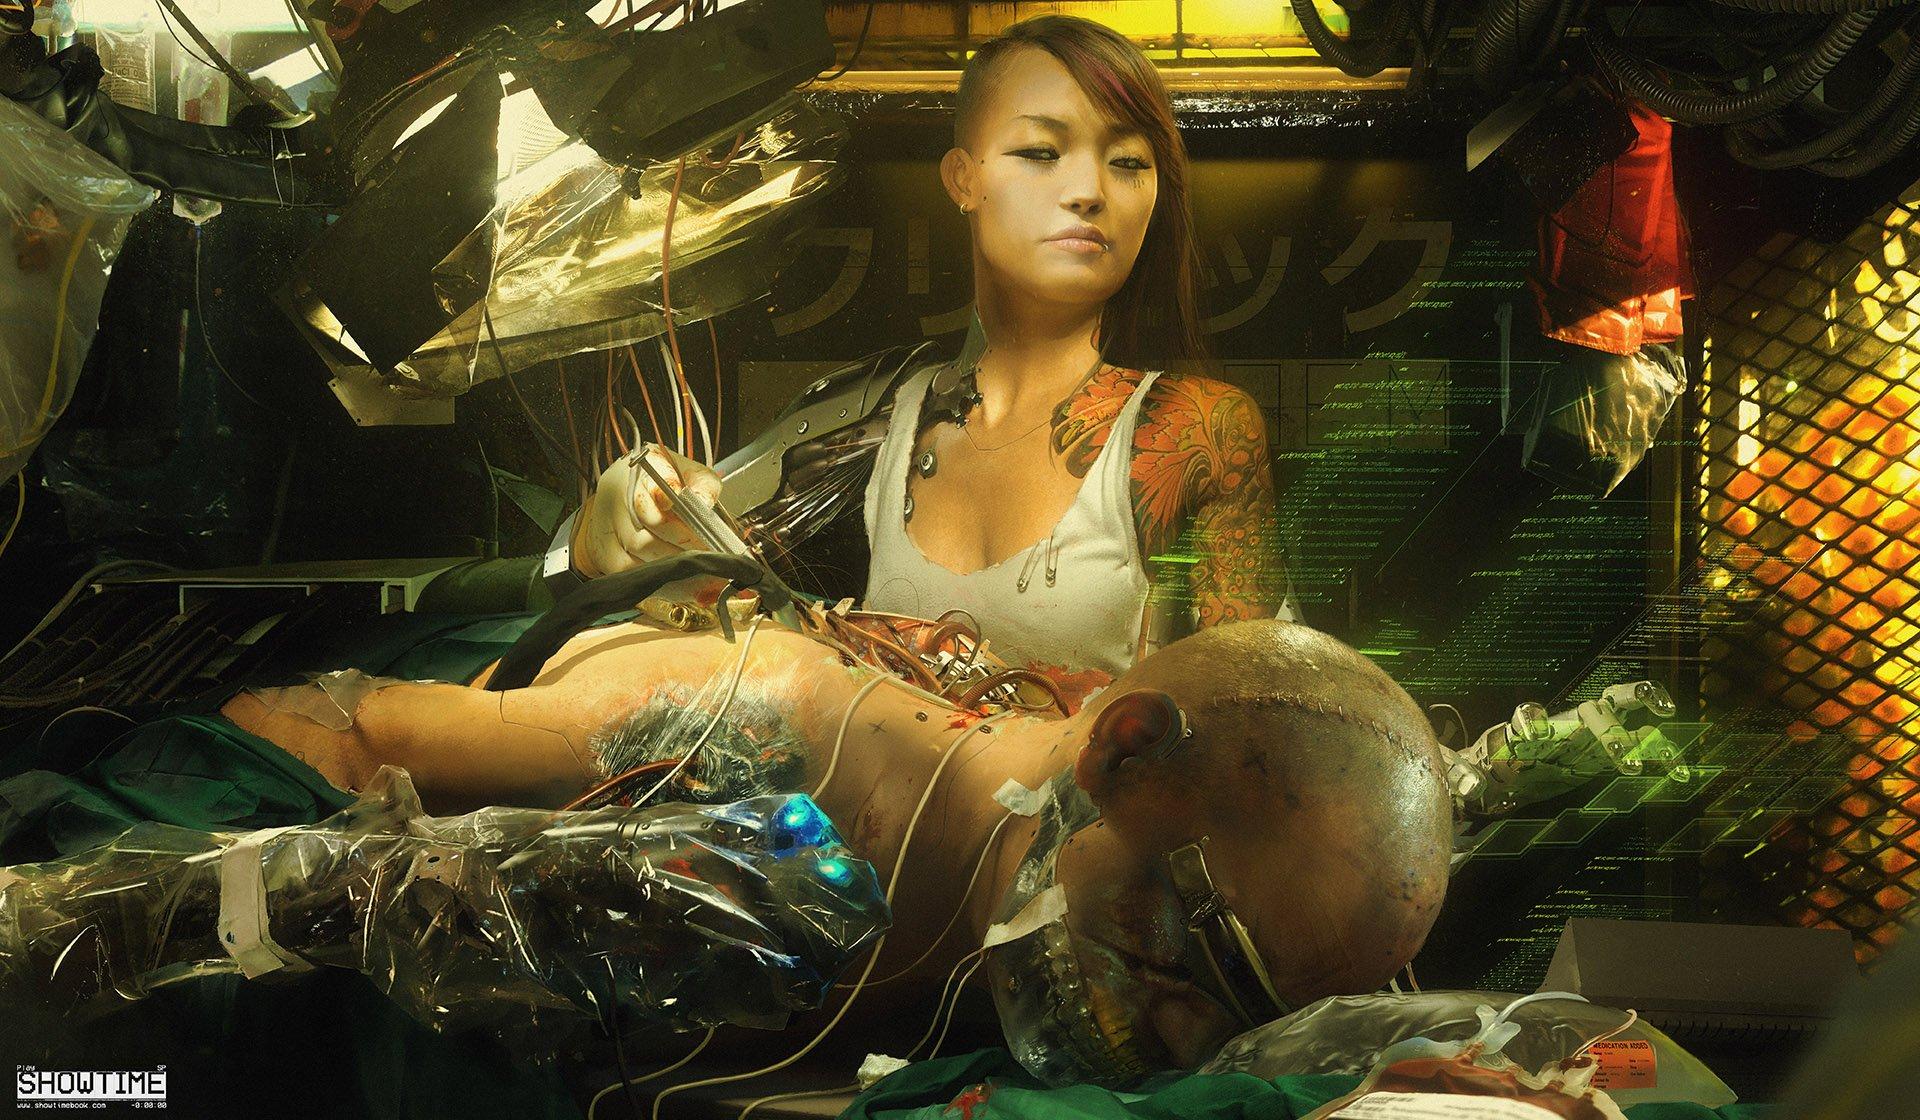 General 1920x1120 cyberpunk tattoo robot women inked girls science fiction futuristic